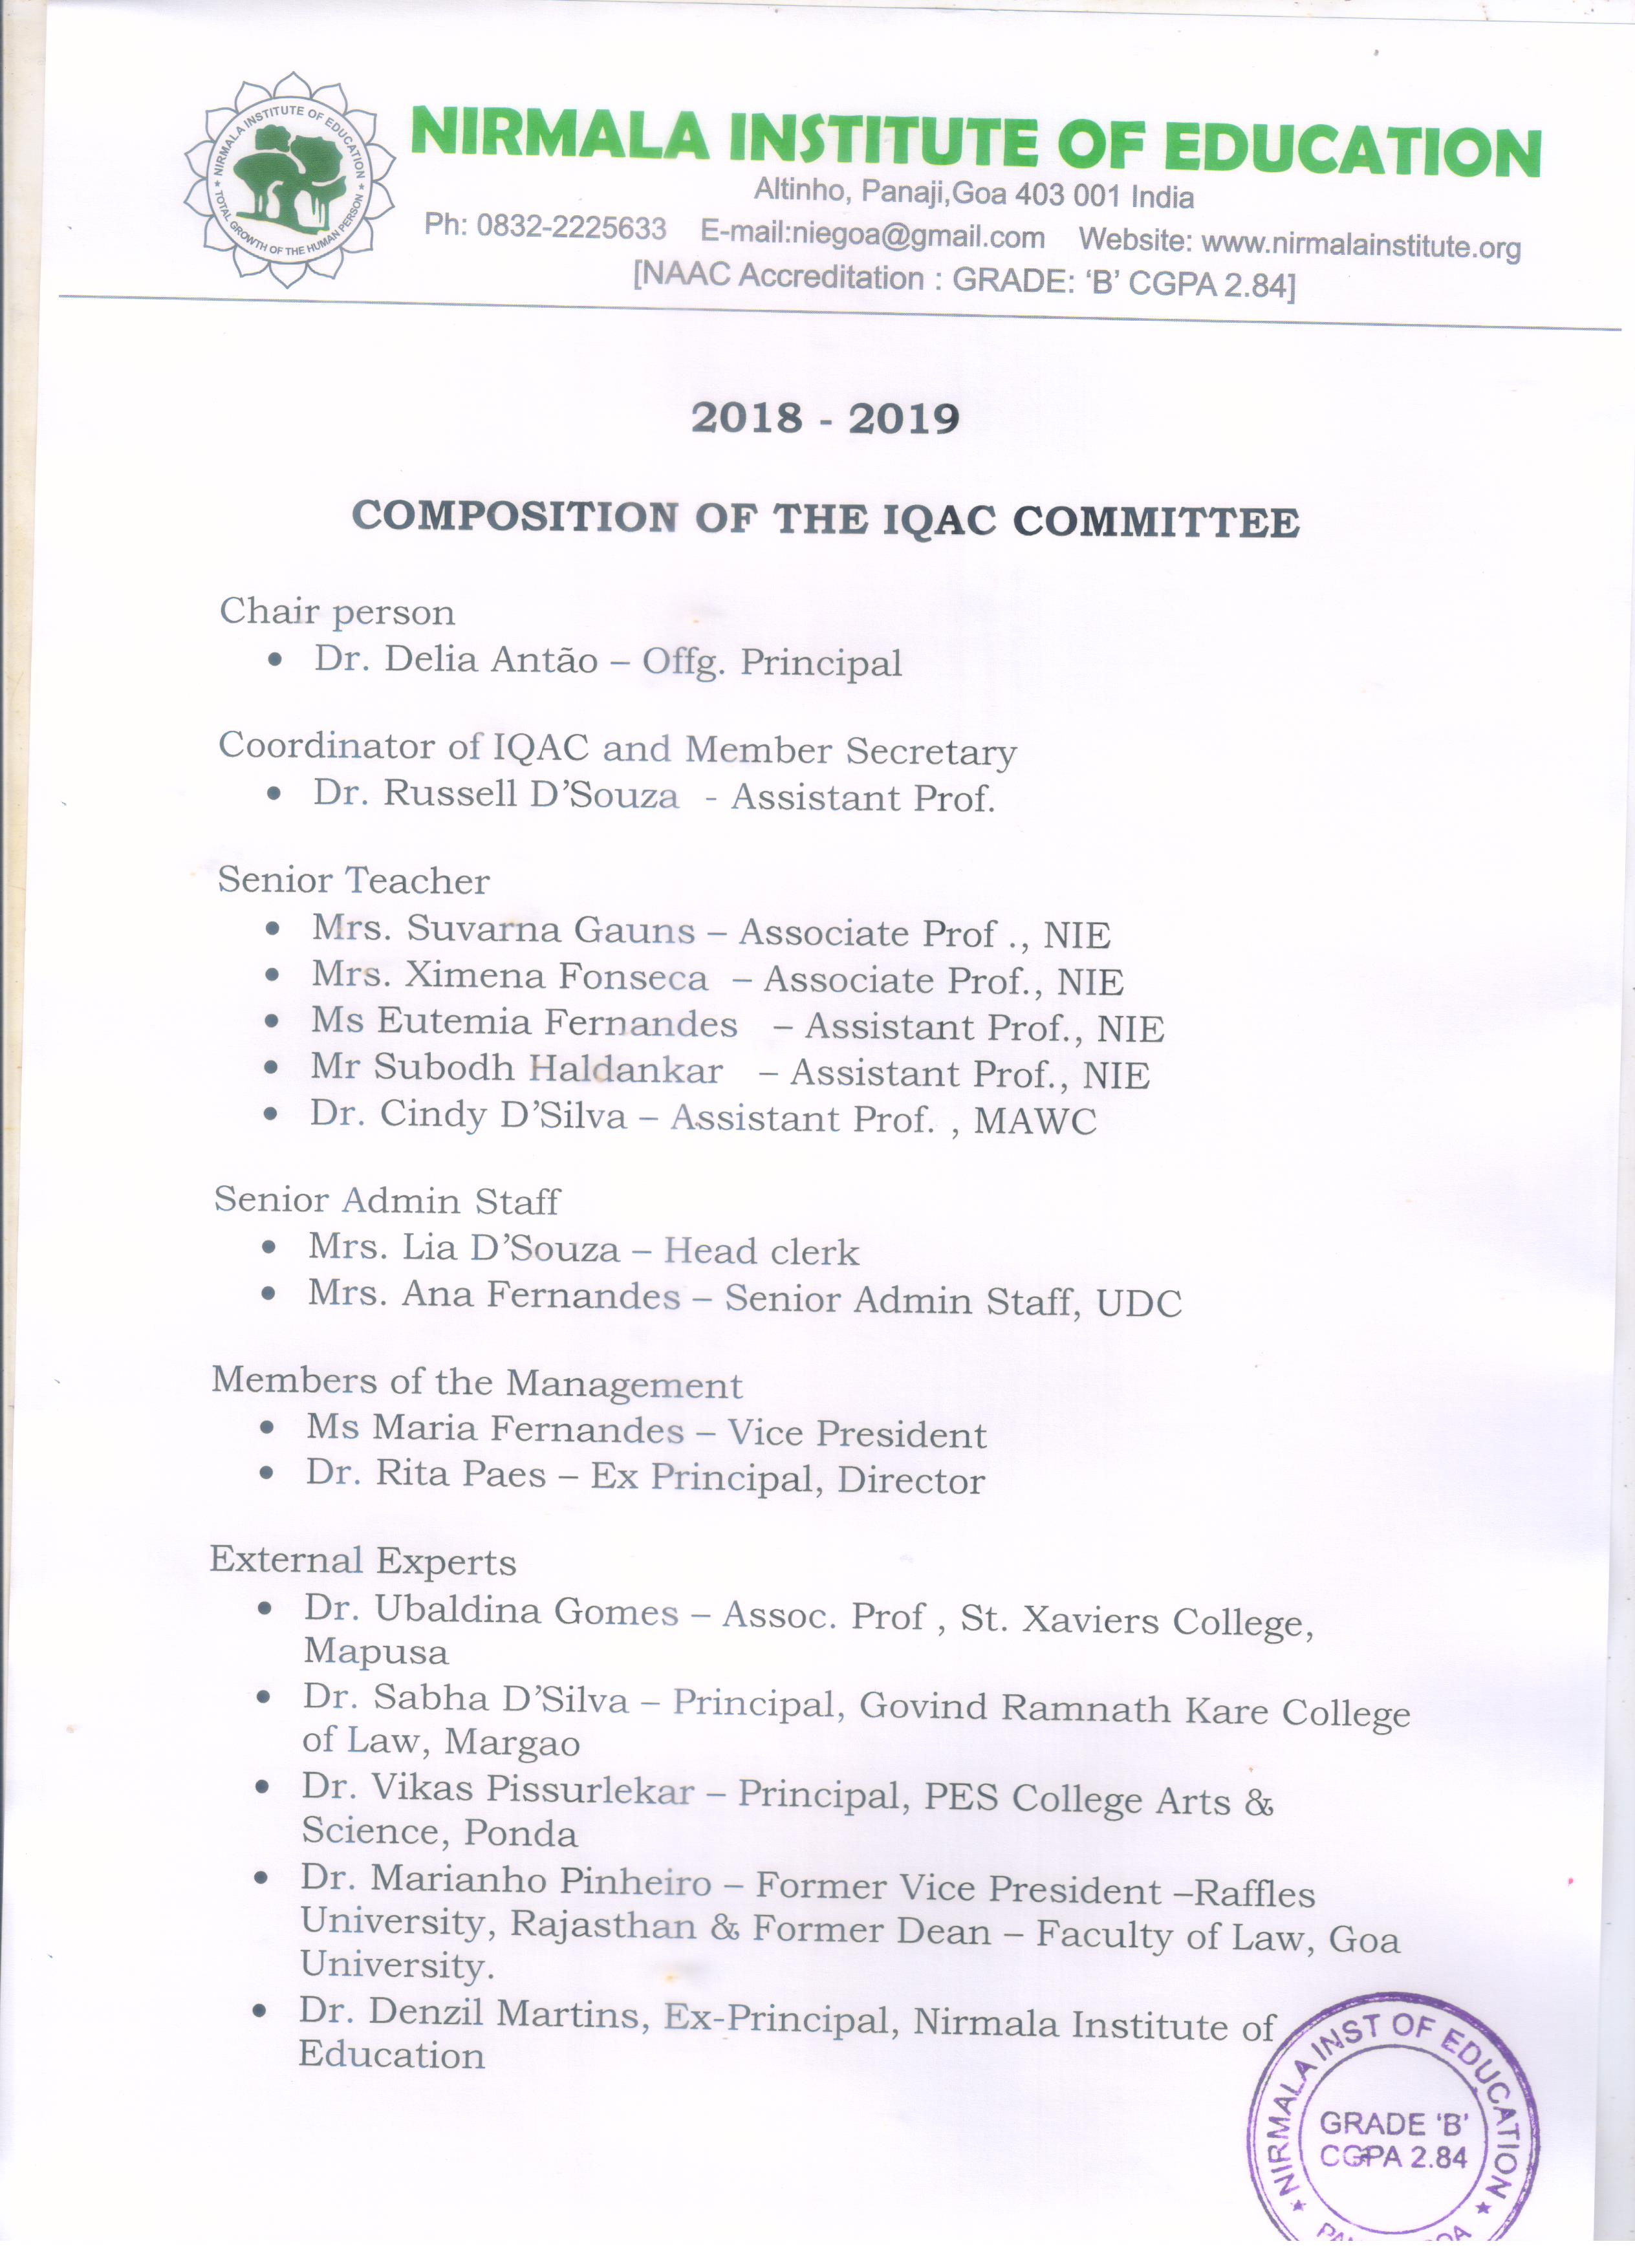 IQAC Composition 2018 - 19